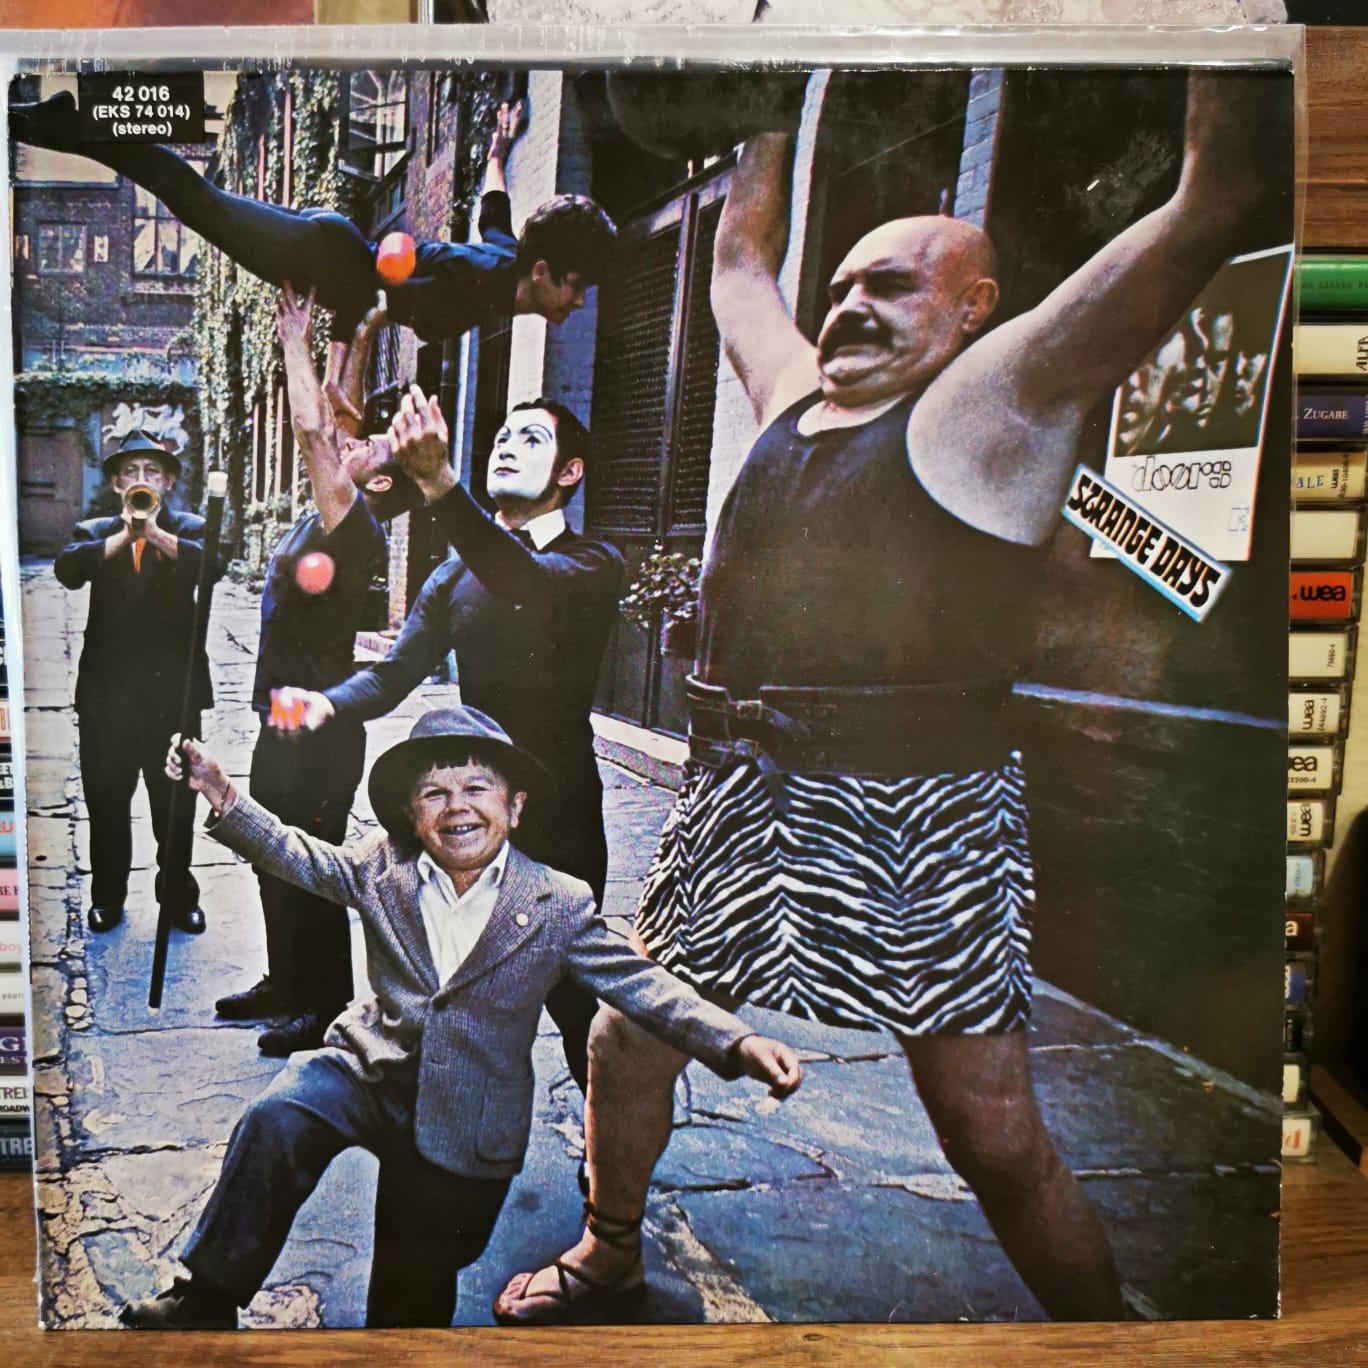 THE DOORS - STRANGE DAYS - Vinyl, LP, Album,80's Reissue, 180g